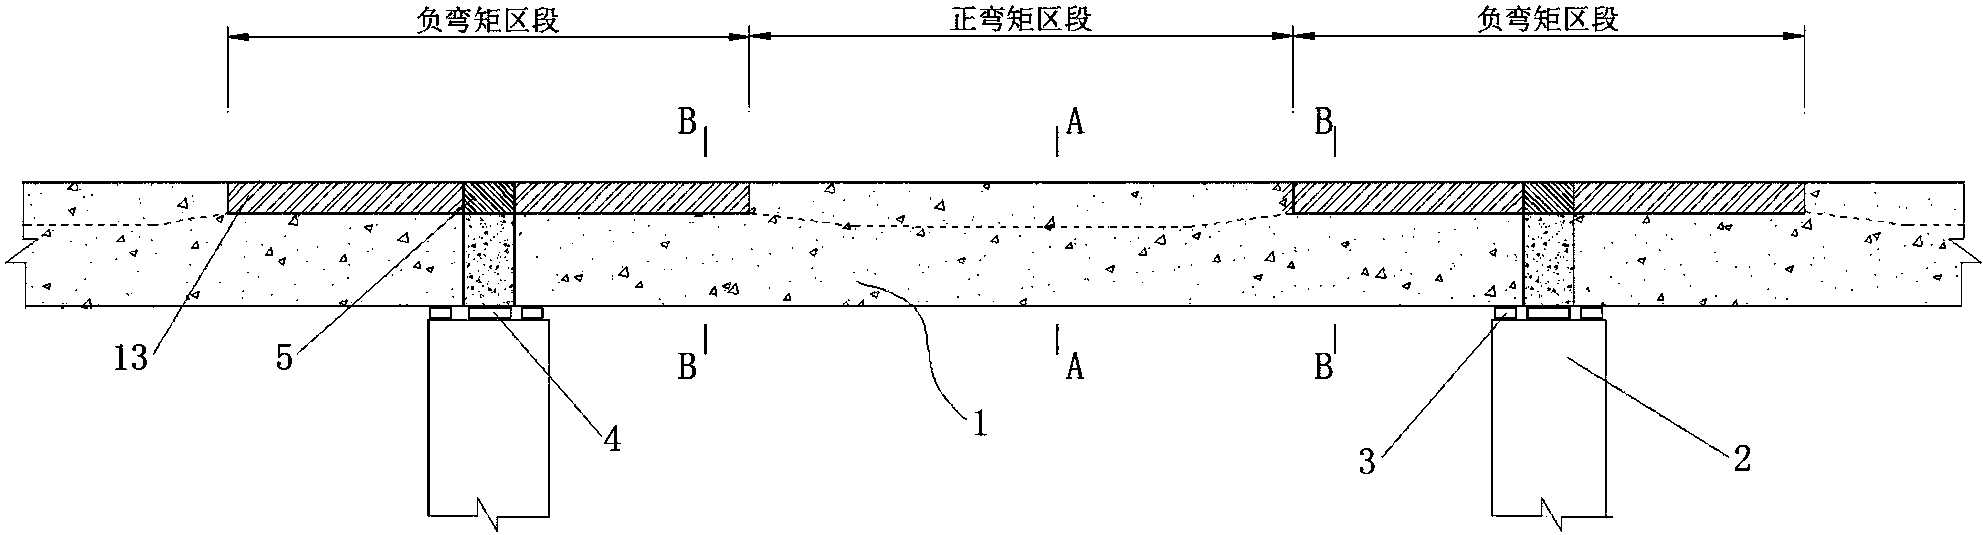 cn108252222a_鋼—混凝土組合結構式先簡支后連續梁橋方法在審圖片